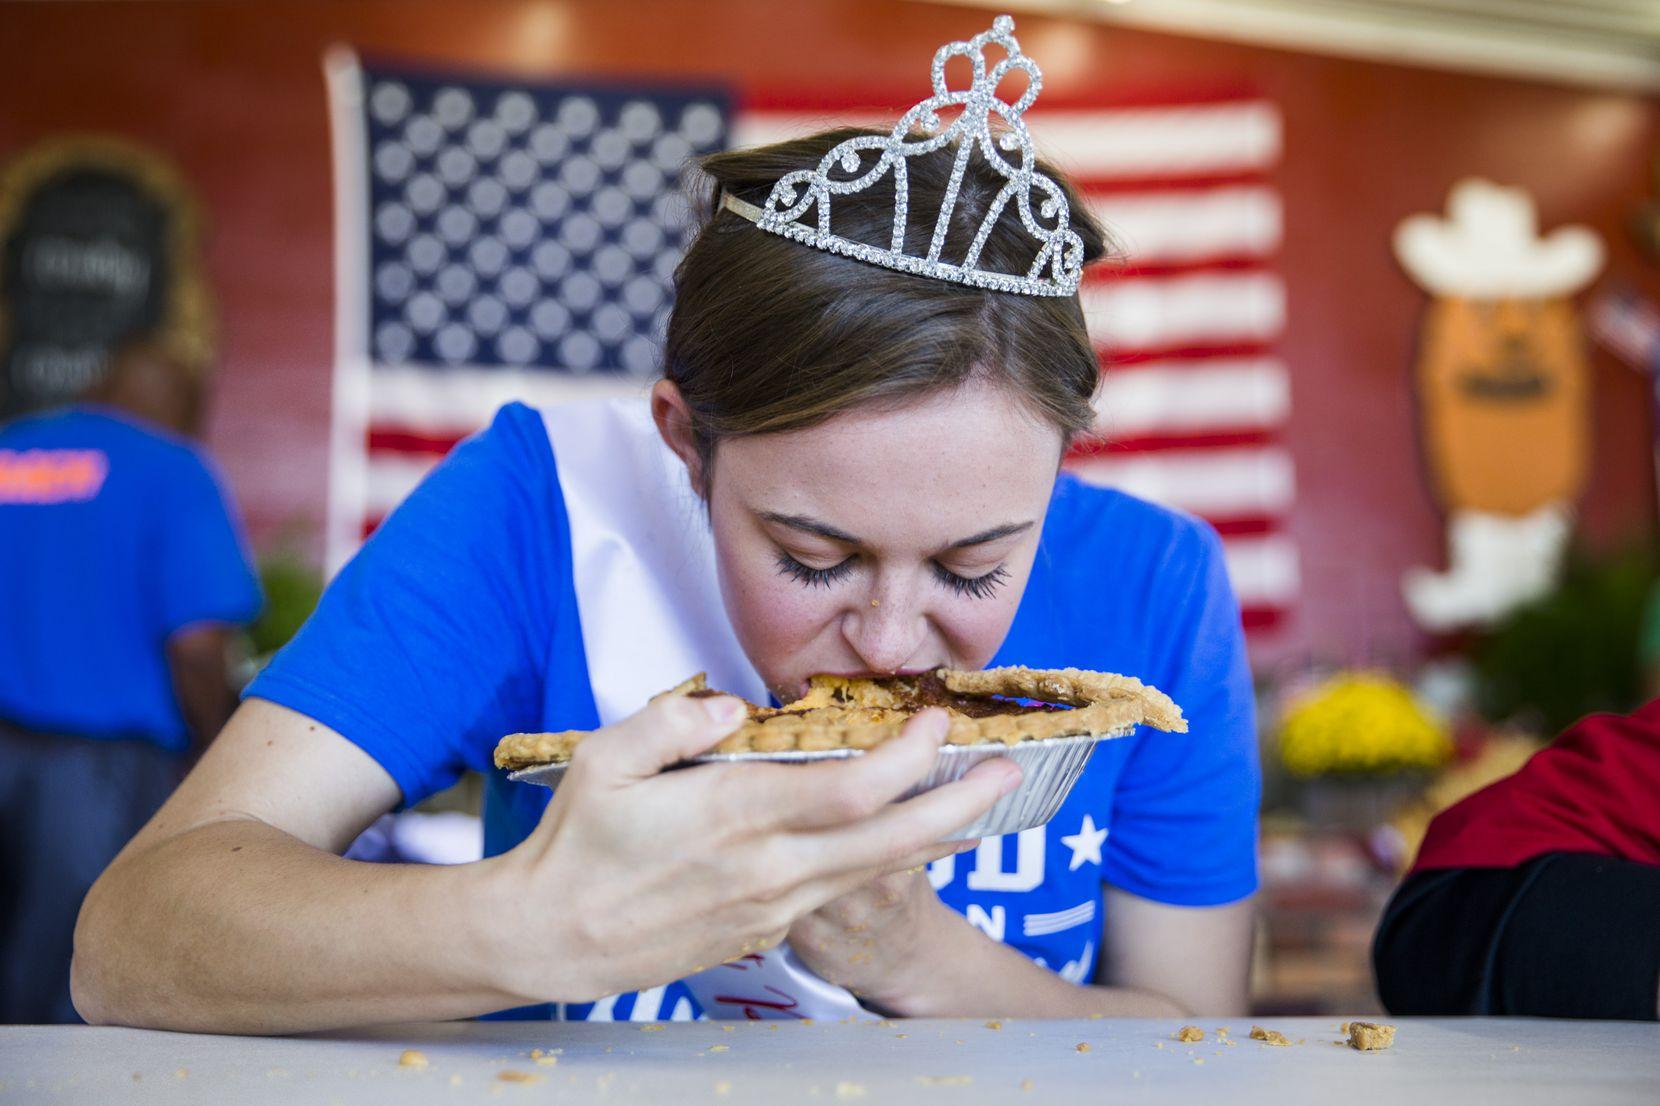 Golden Sweet Potato Queen Macie Pendergrass, 18, participates in a sweet potato pie eating contest during the Golden Sweet Potato Festival Festival on October 27, 2018 in Golden, Texas.